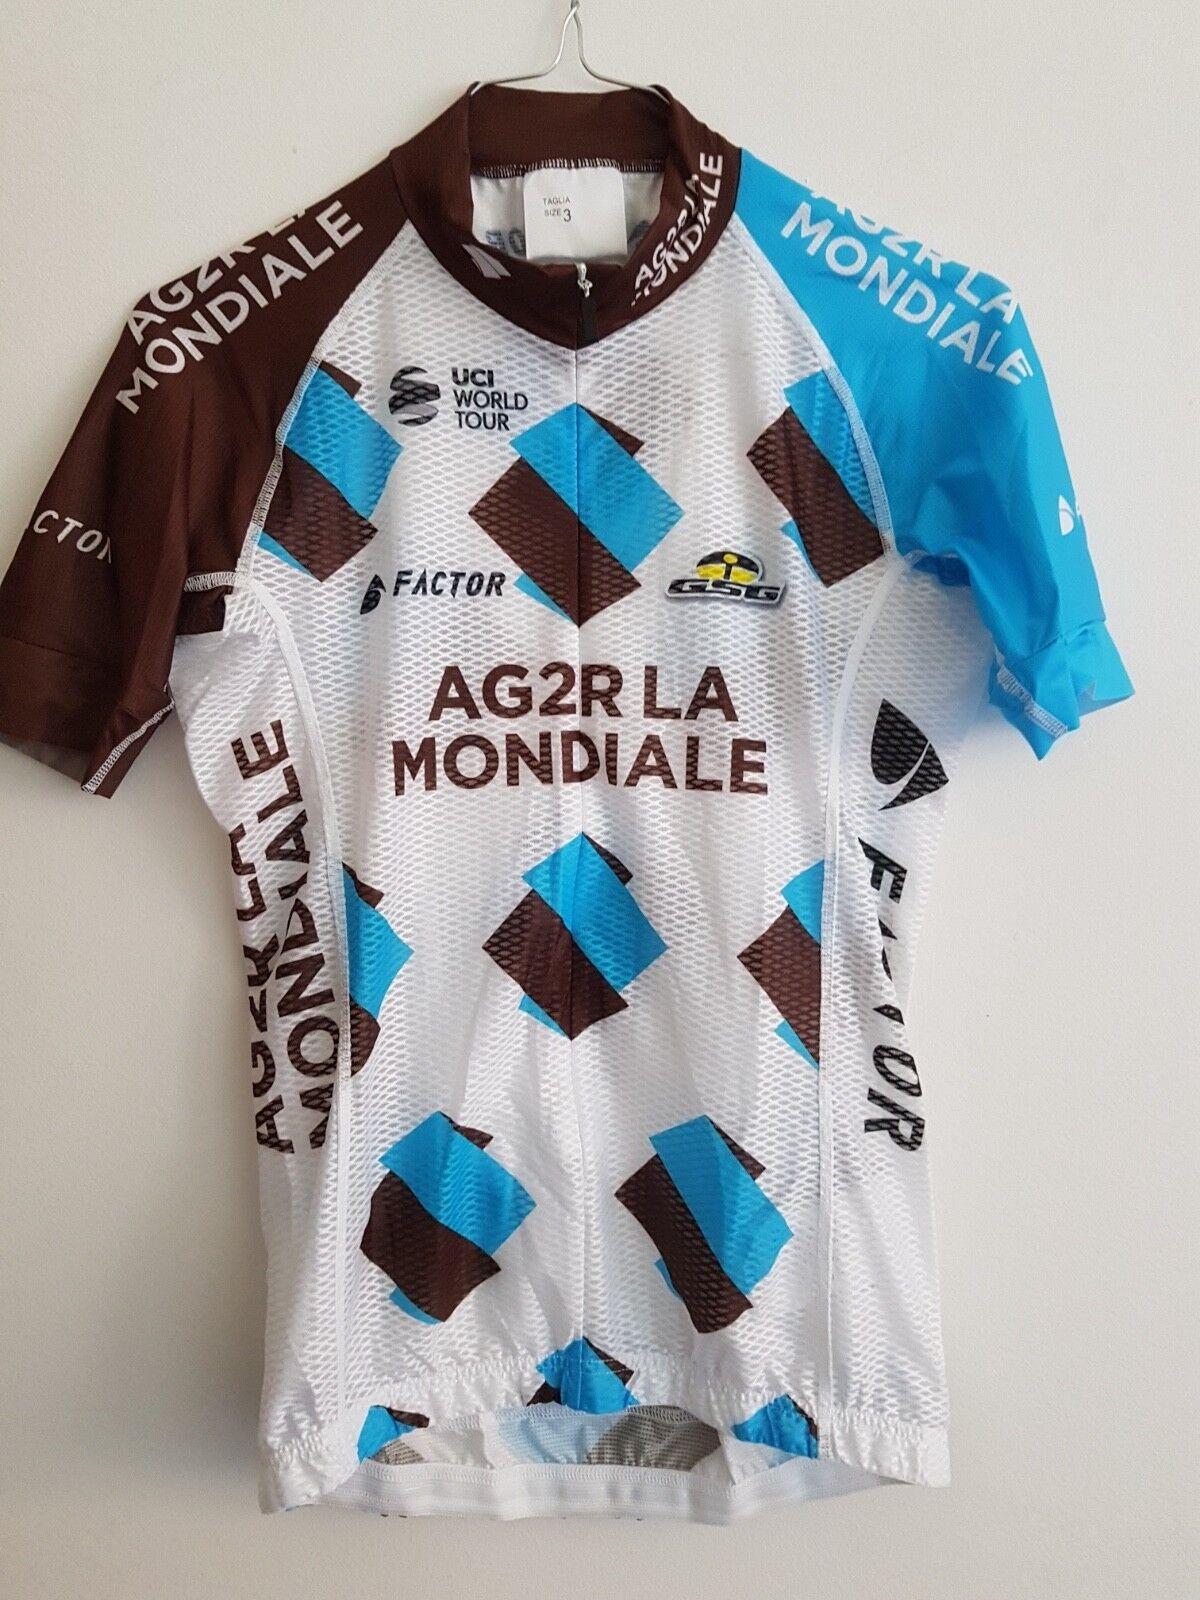 Maillot cycliste vélo BARBIER cyclisme tour de france Radfahren jersey radtrikot